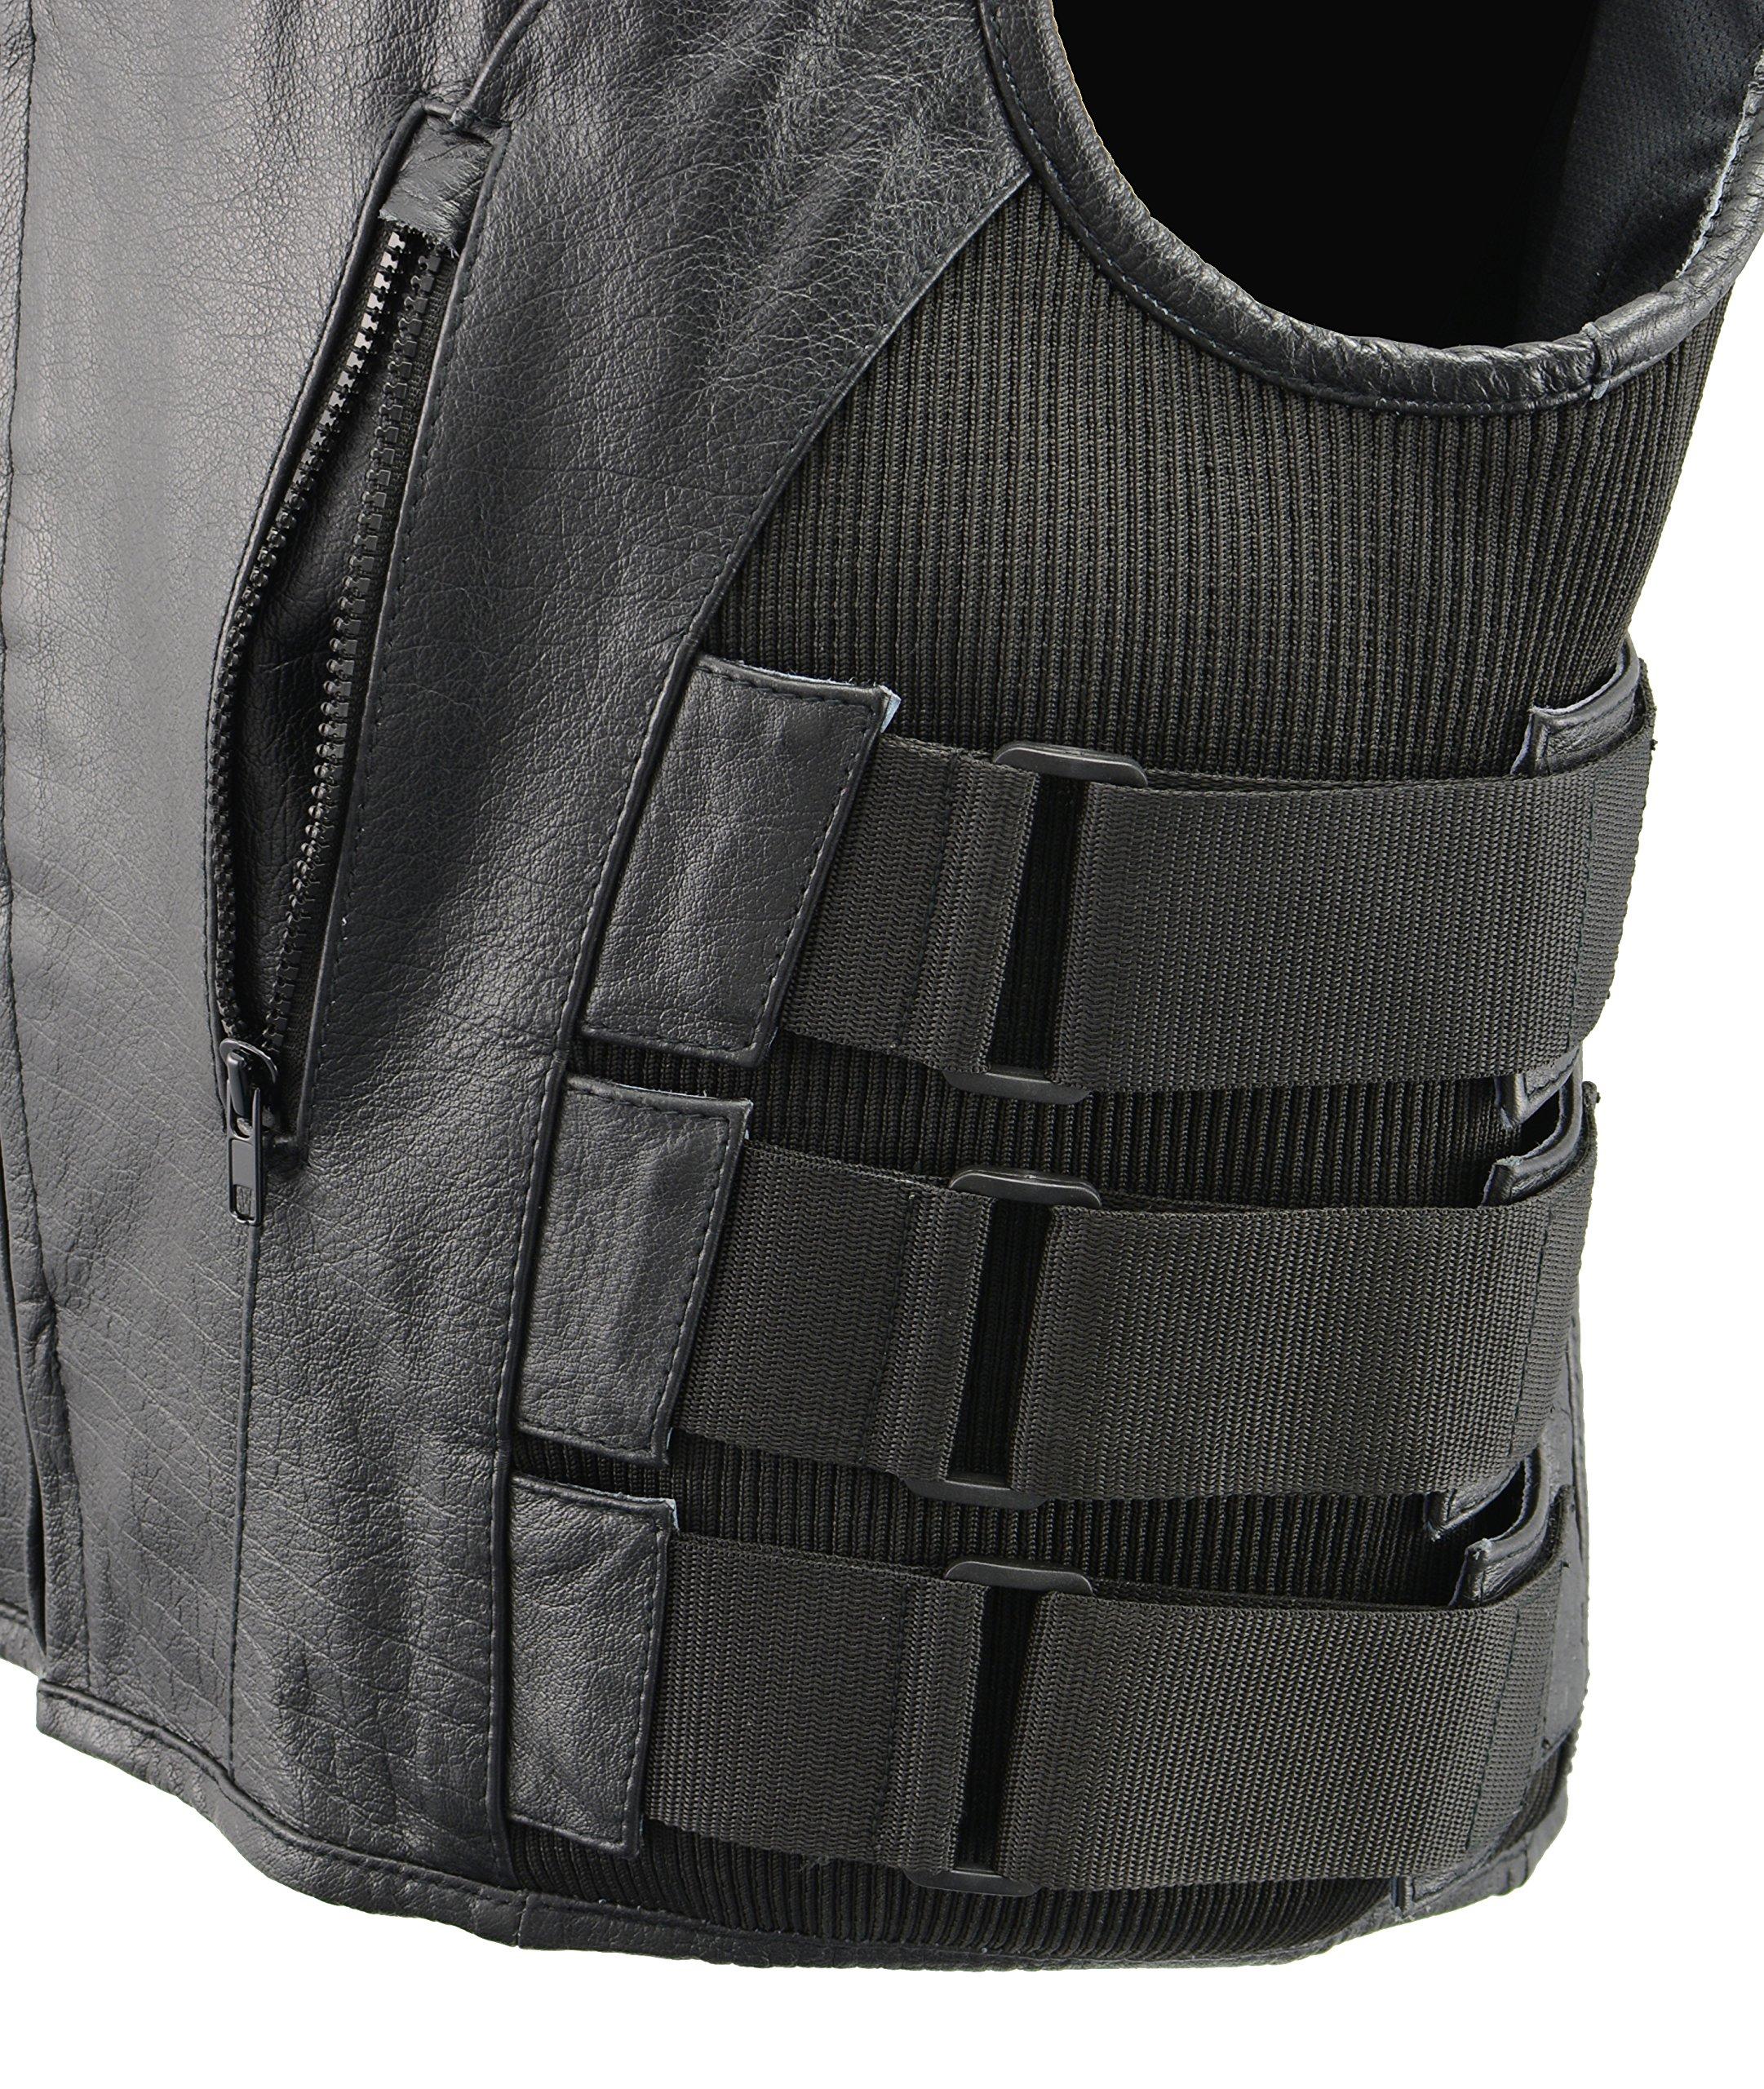 Men's Leather SWAT Style Vest | Premium Natural Buffalo Leather | Patch Access Lining, New Outseam Gun Pocket, Adjustable Side Straps, Zipper Front Closure | Black Biker Vest (Black, 3X-Large) by The Bikers Zone (Image #5)